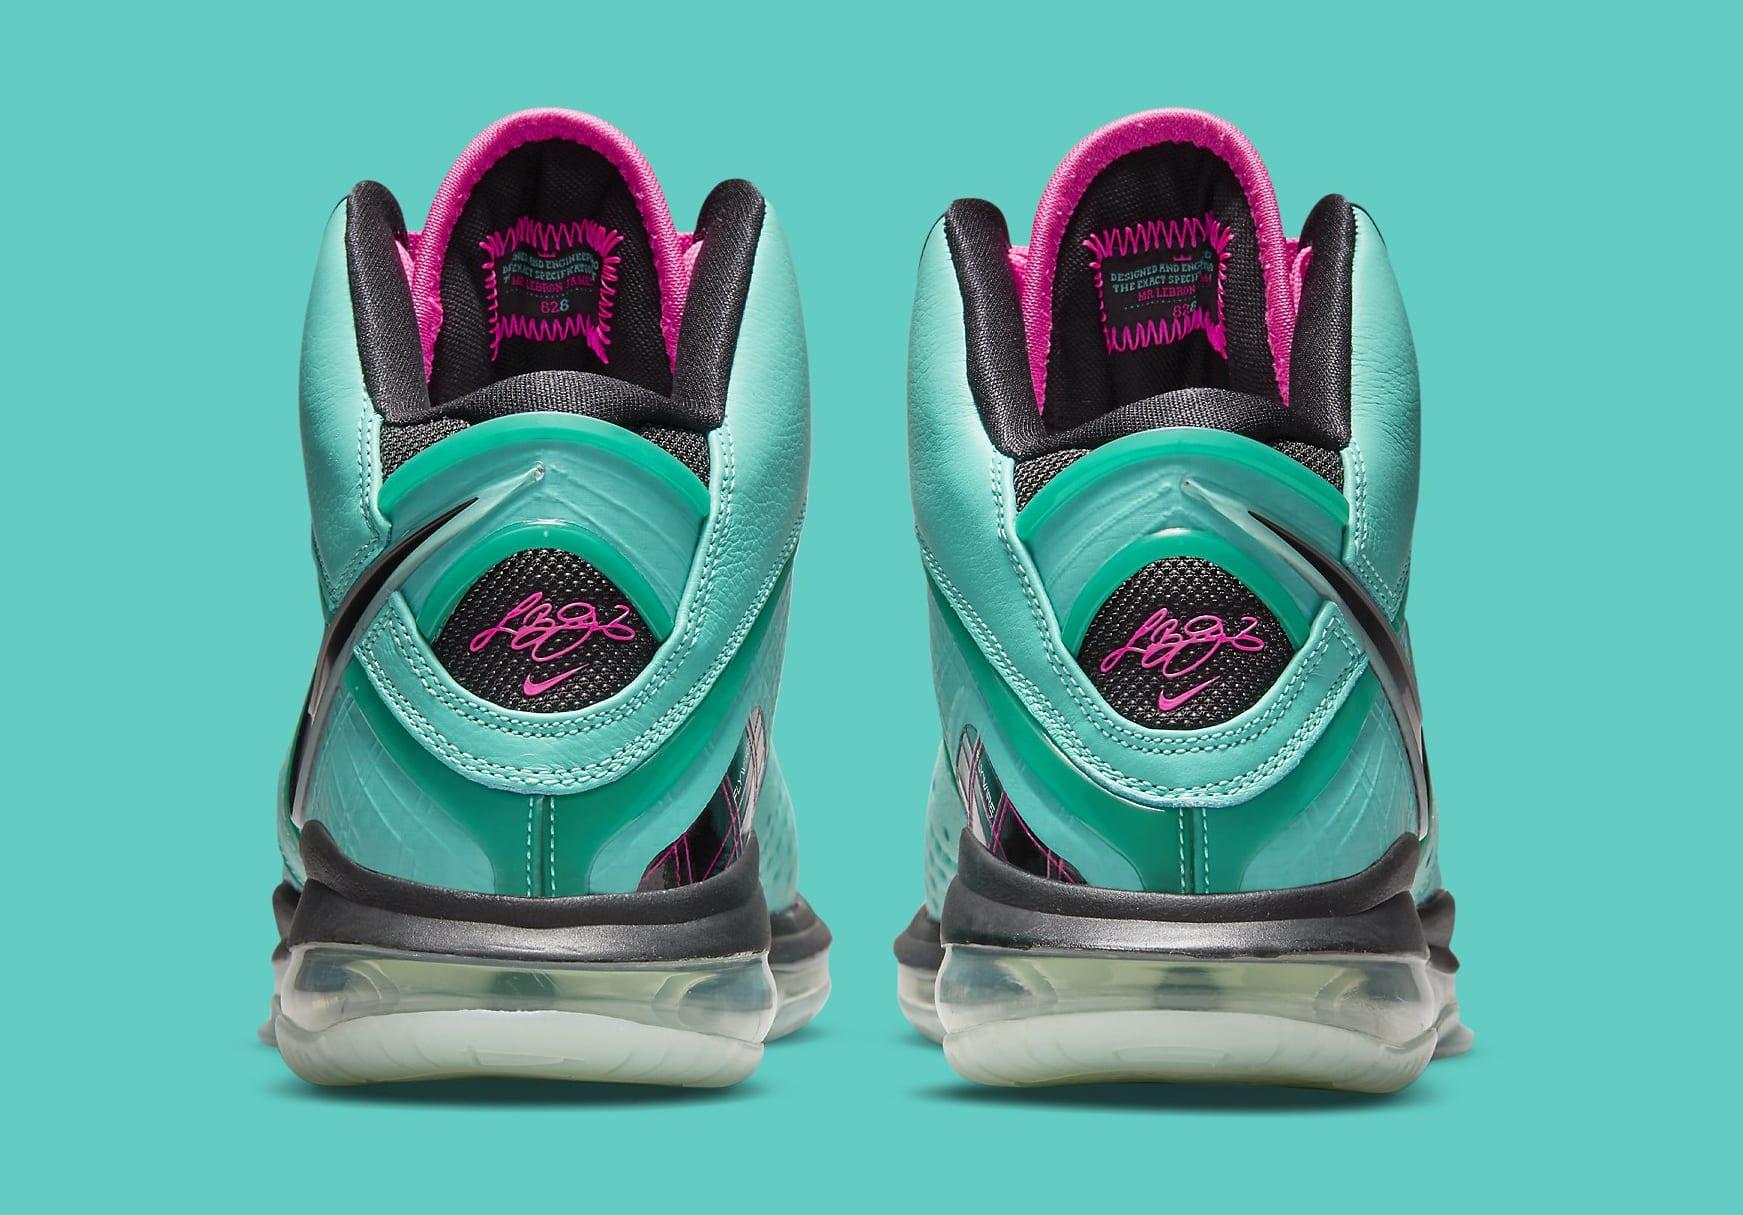 Nike LeBron 8 'South Beach' CZ0328-400 Heel